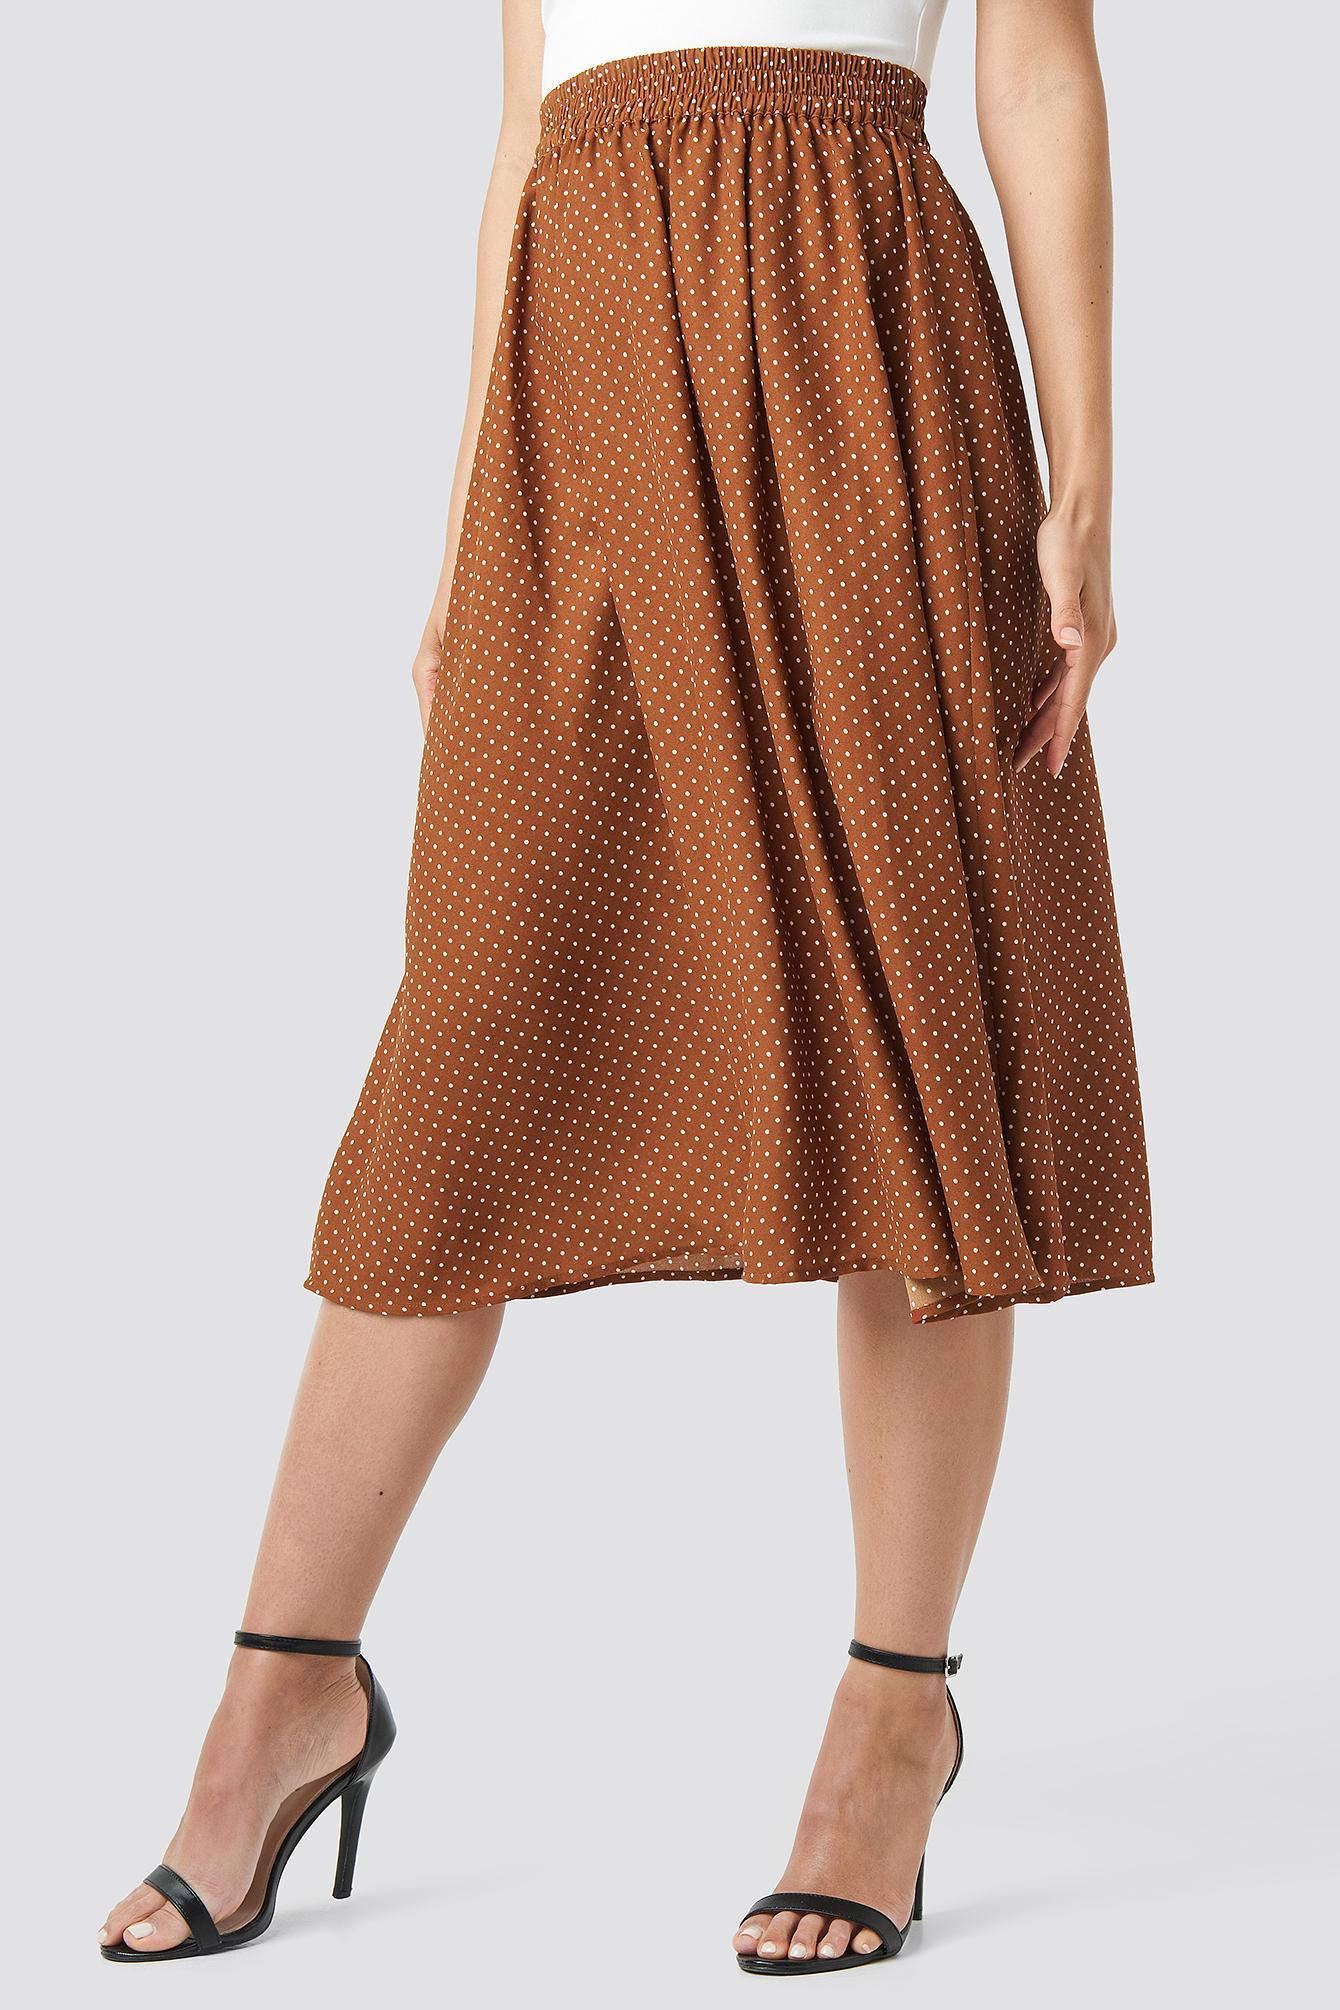 9f9464ef41 NA-KD - Dotted Midi Skirt Brown - Lyst. View fullscreen